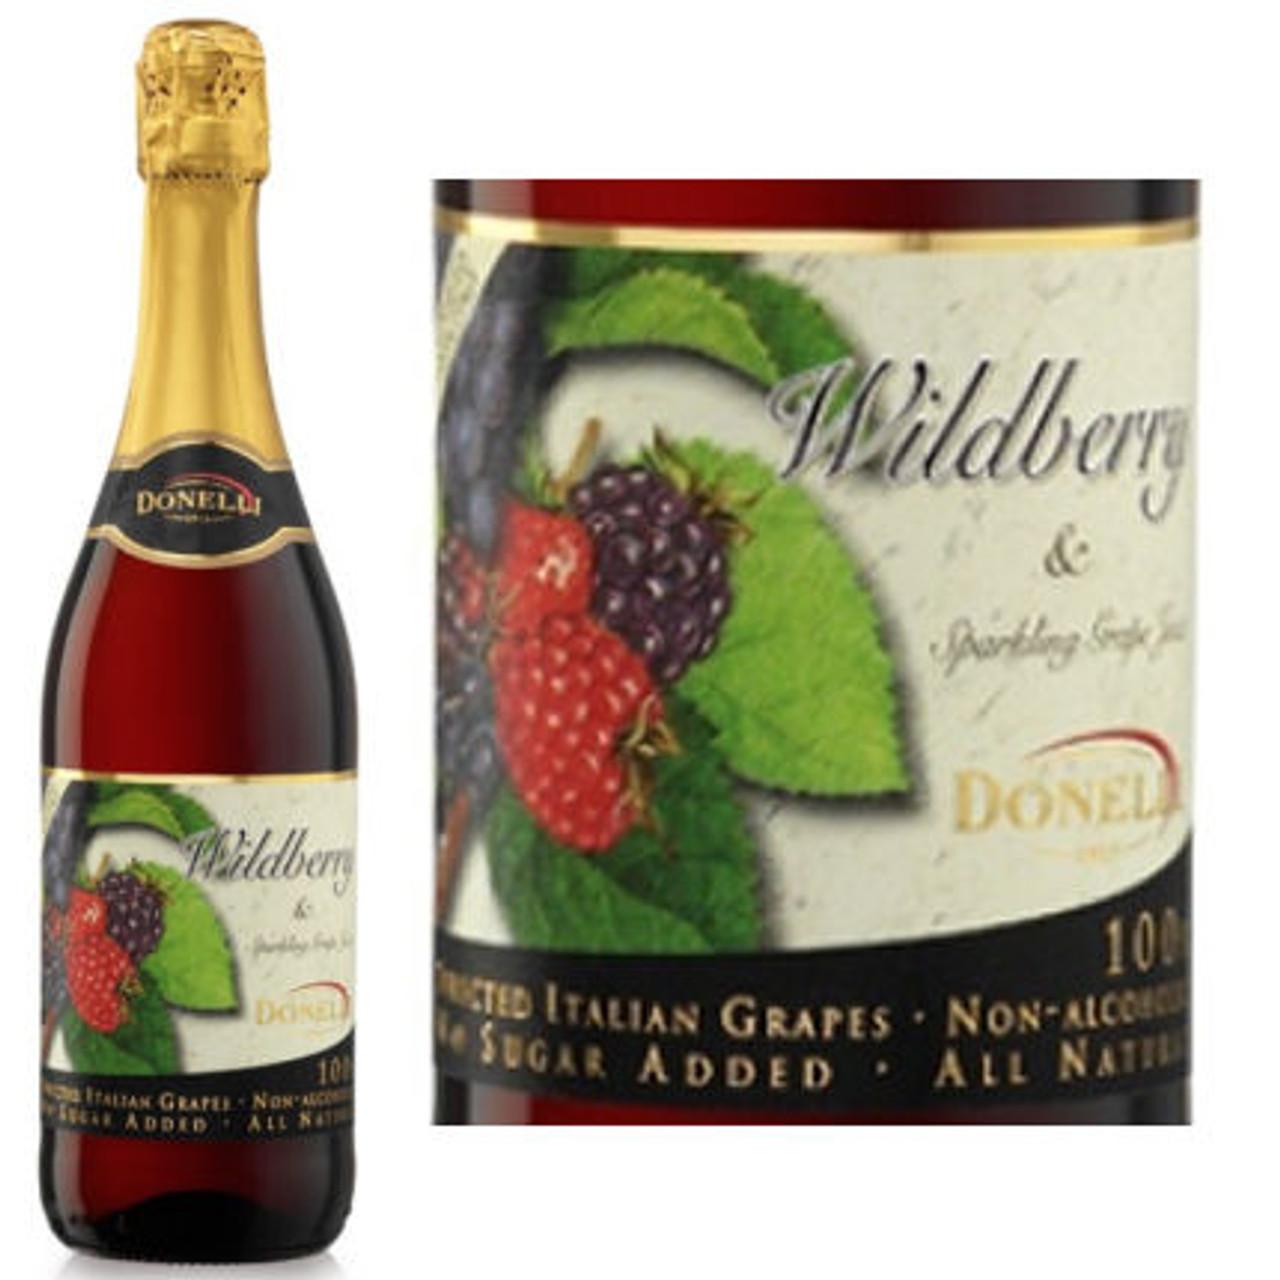 Donelli Wildberry Flavor Sparkling Grape Juice NA